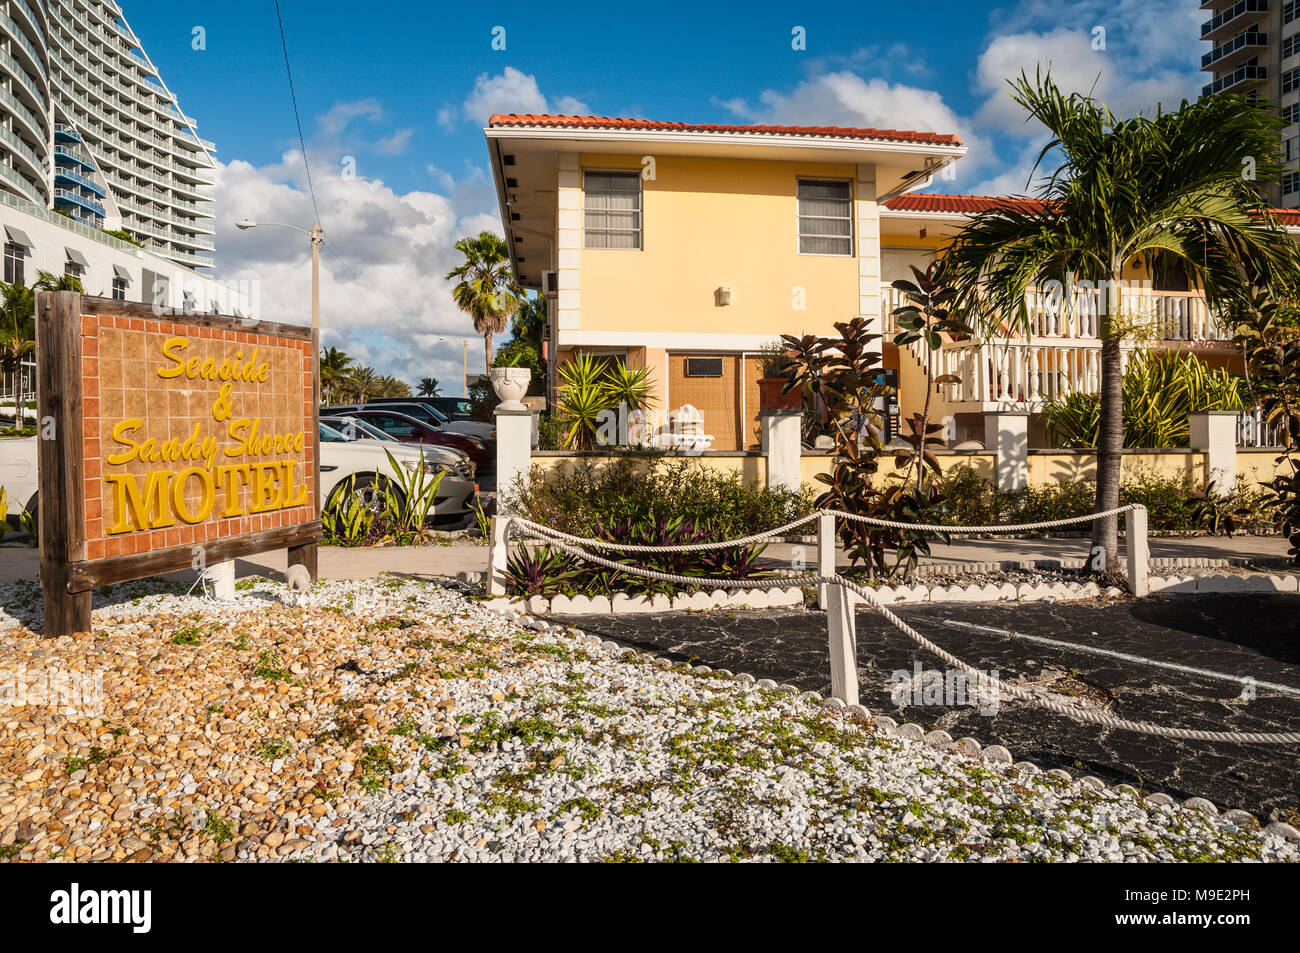 Hilton Fort Lauderdale Stock Photos & Hilton Fort Lauderdale Stock ...